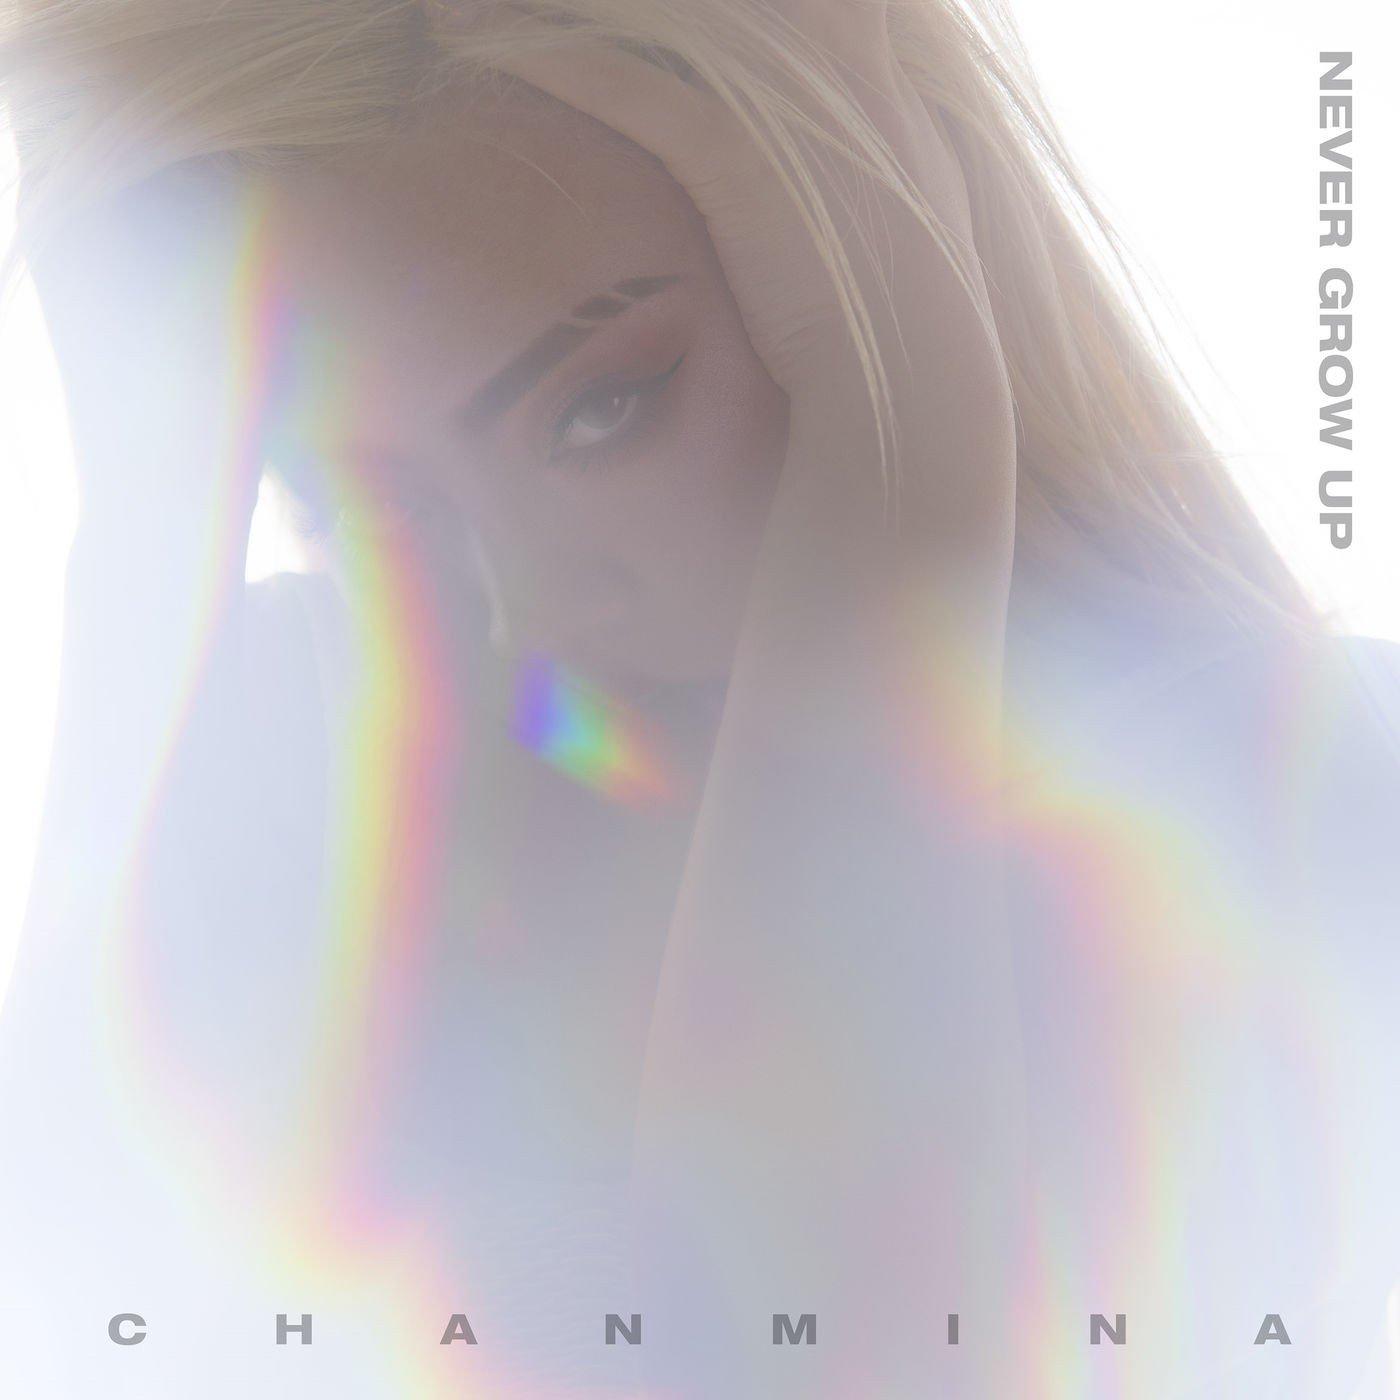 Chanmina (ちゃんみな) – Never Grow Up [FLAC + MP3 320 / WEB] [2019.07.19]